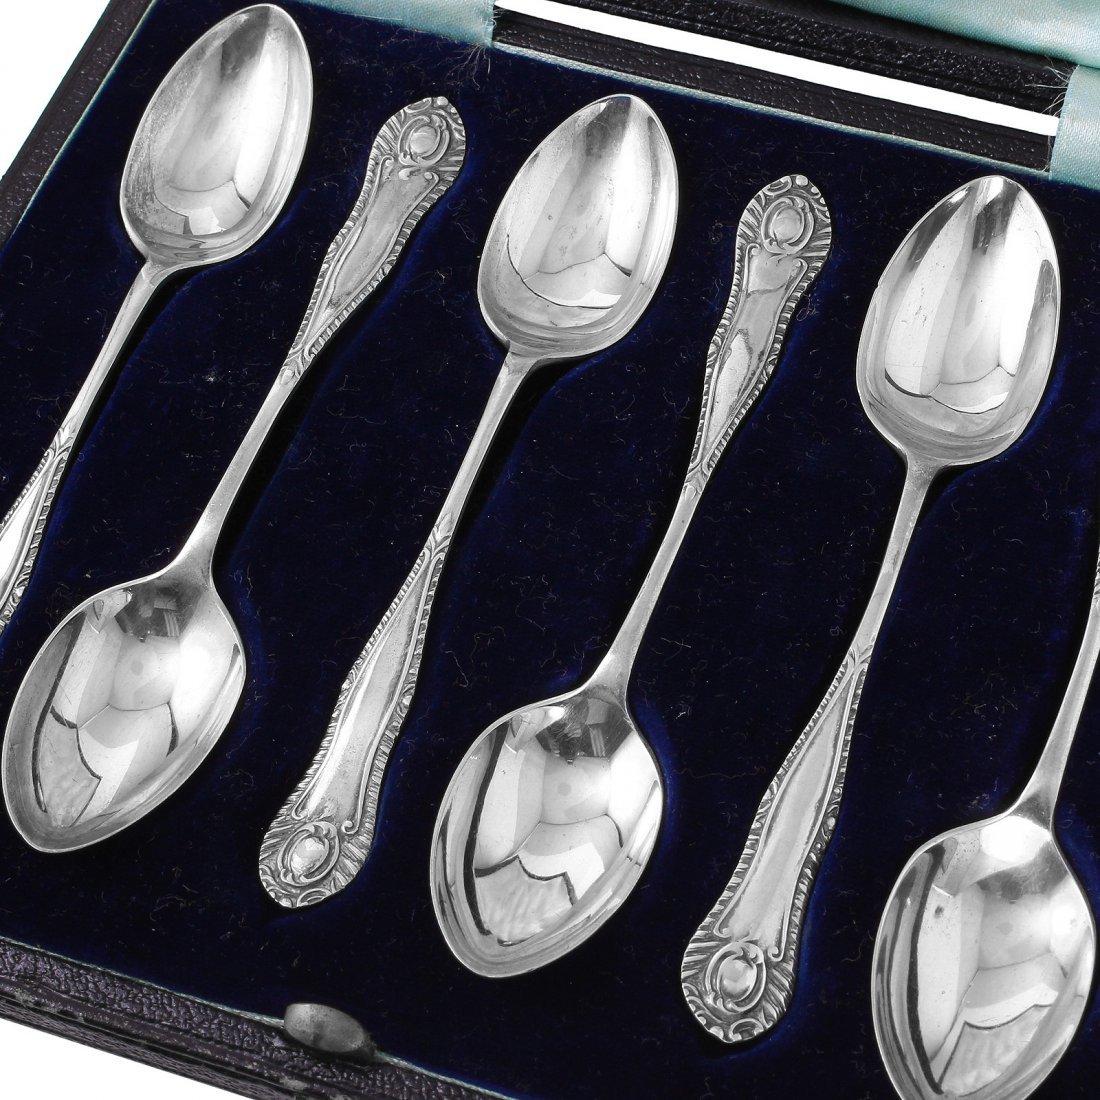 Six Vintage H. Fisher & Co. Sterling Demitasse Spoons - 2